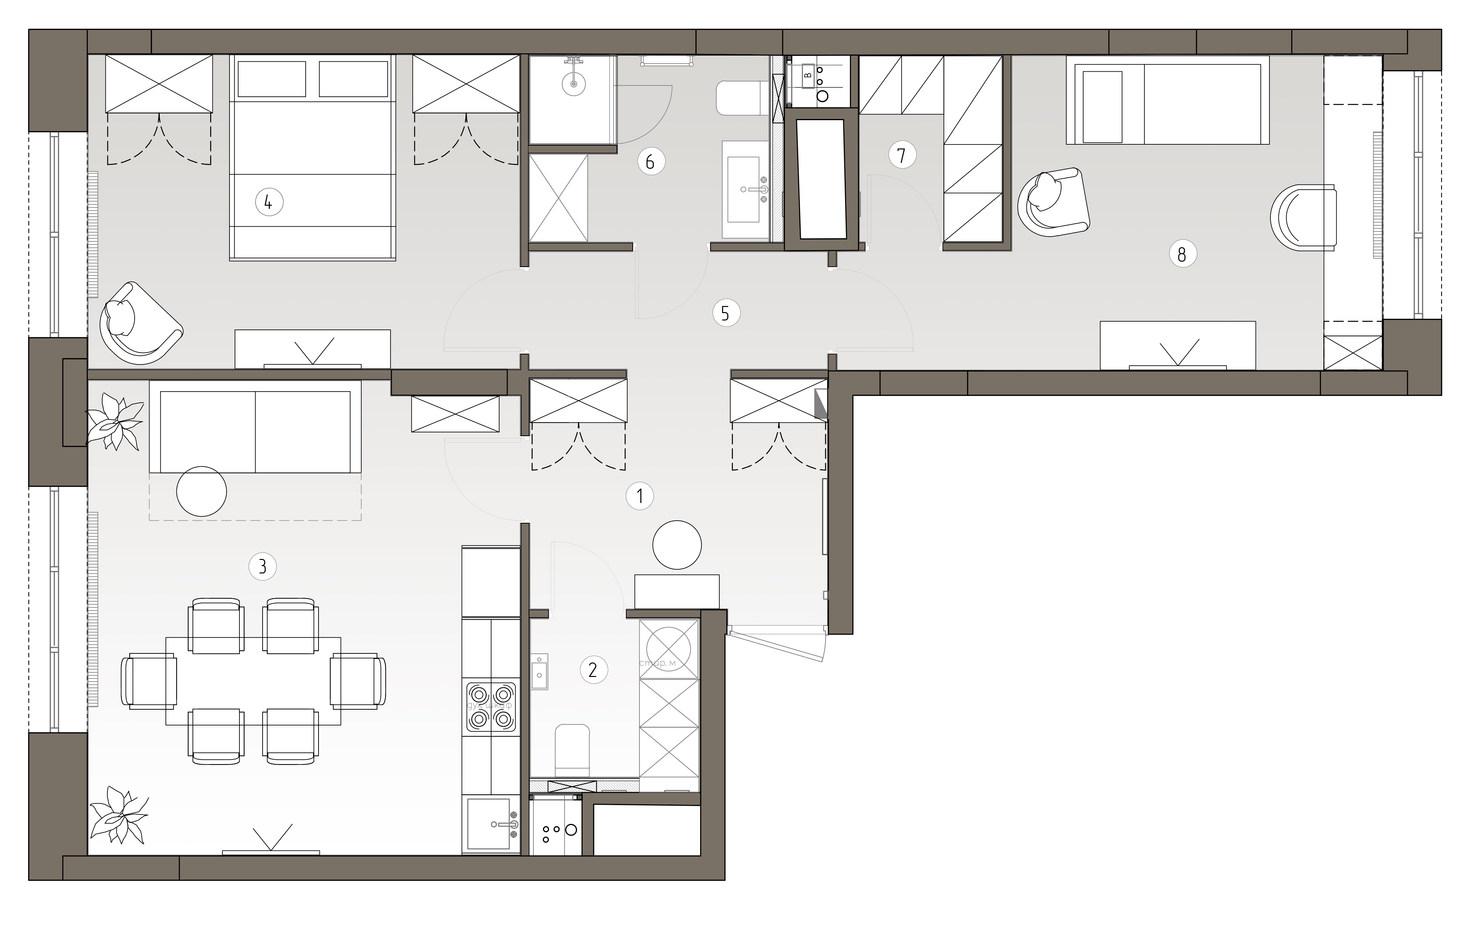 13 02 2020Квартира 1-План с мебелью 1 эт